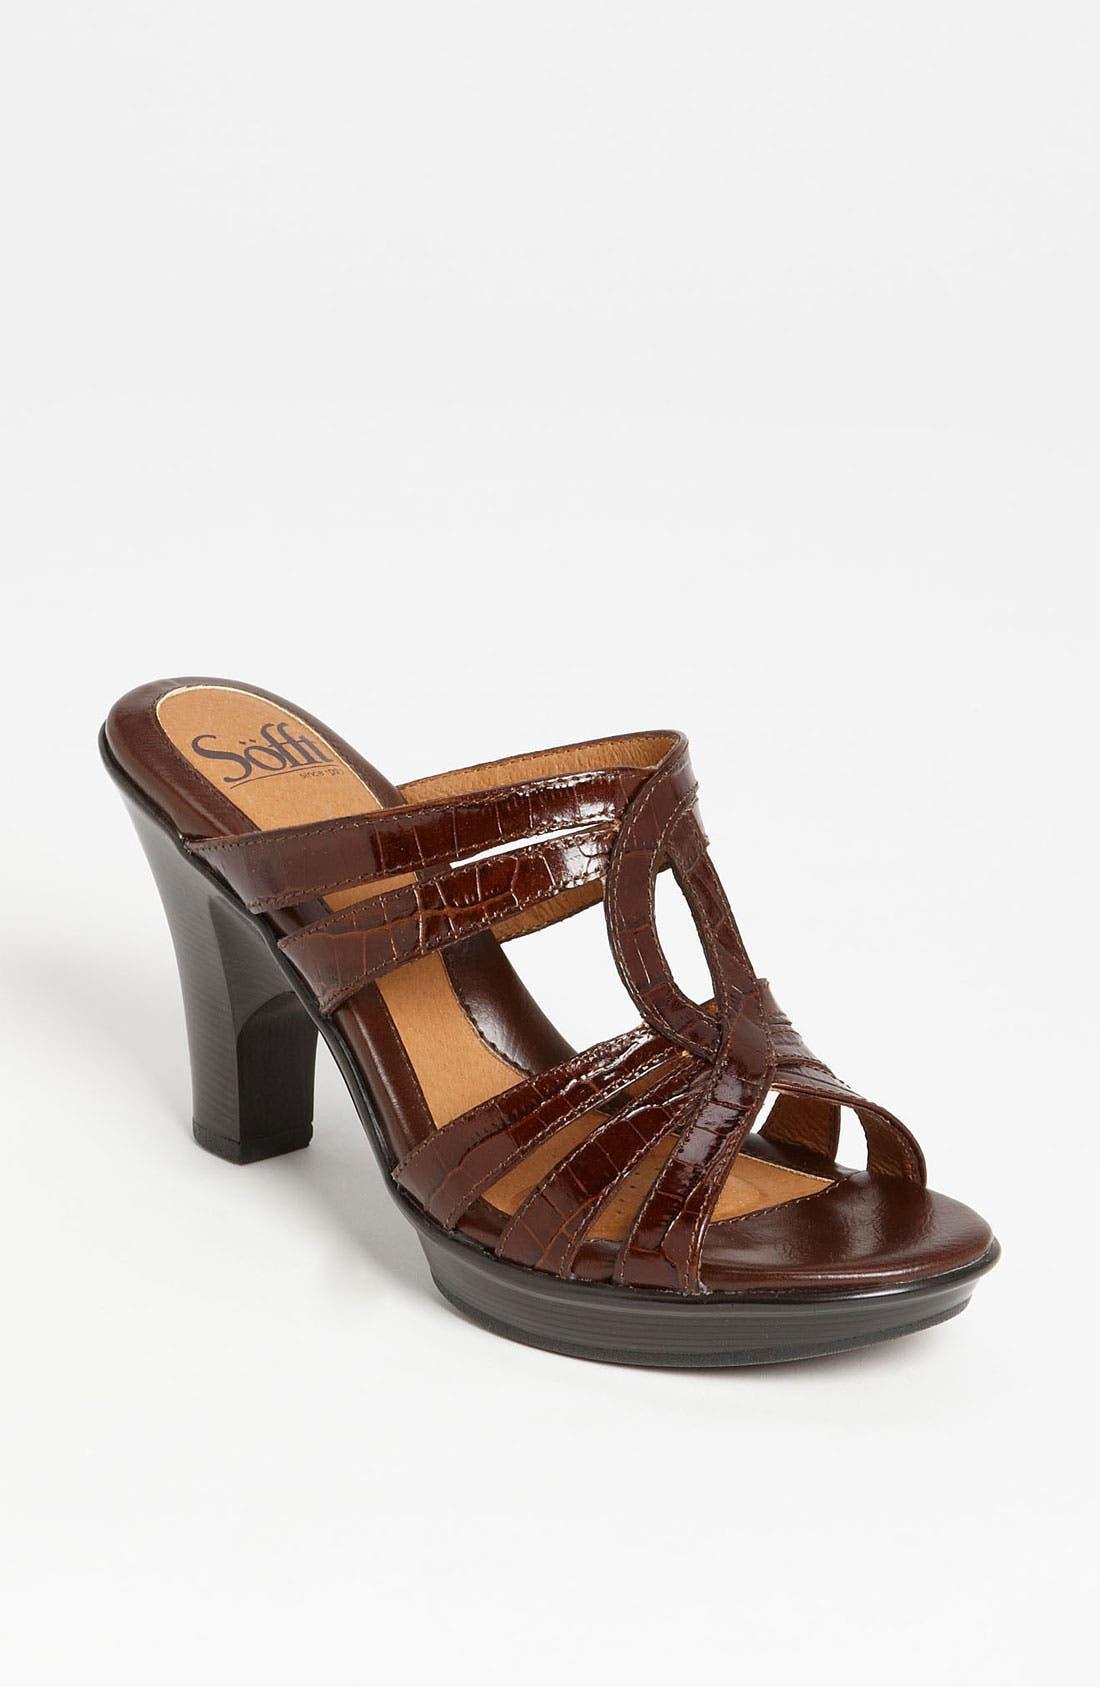 Alternate Image 1 Selected - Söfft 'Pascale' Sandal